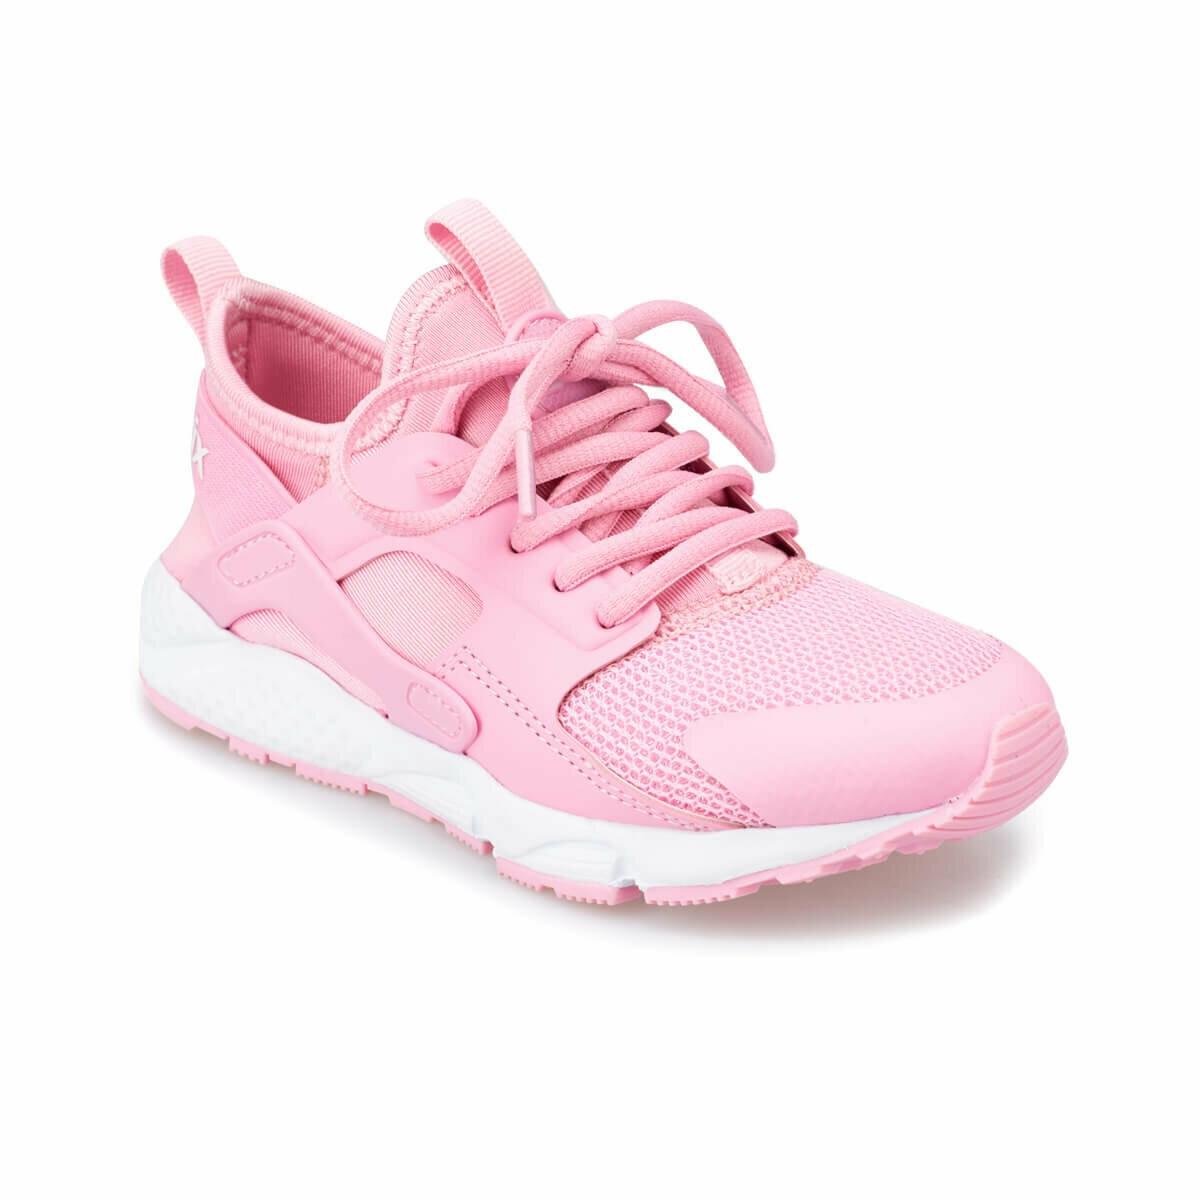 FLO APUS Pink Female Child Sneaker Shoes KINETIX